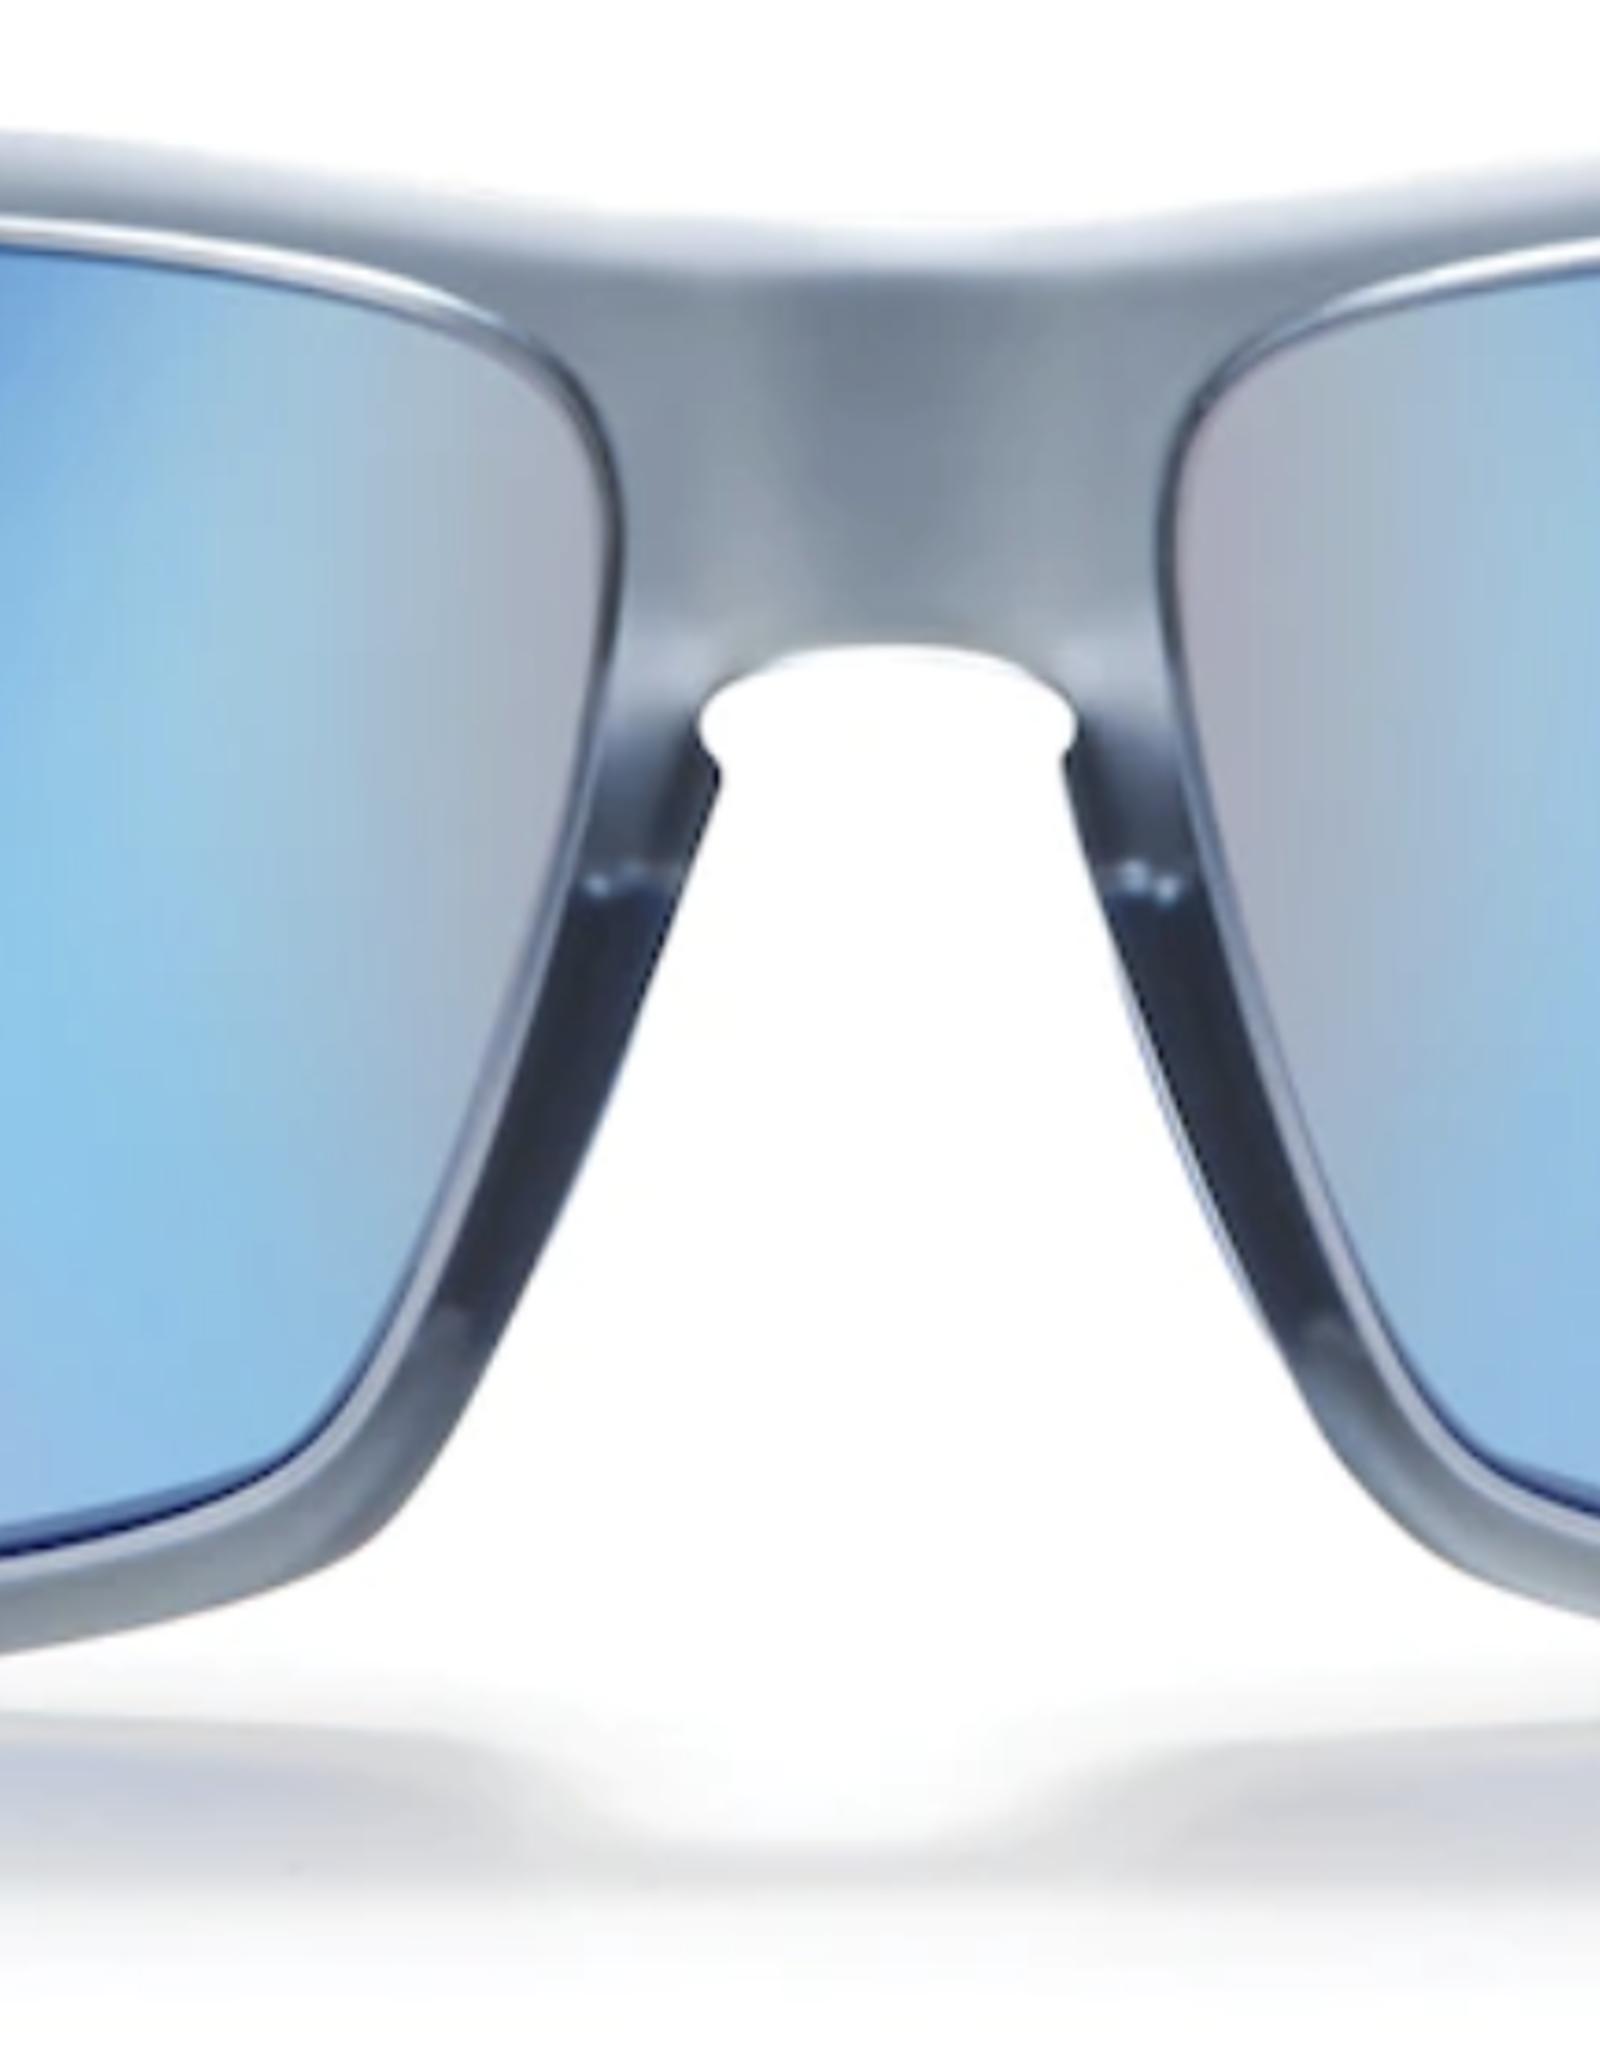 Zeal Incline Matte Smoke Frame with Polarized Horizon Blue Lens Sunglasses